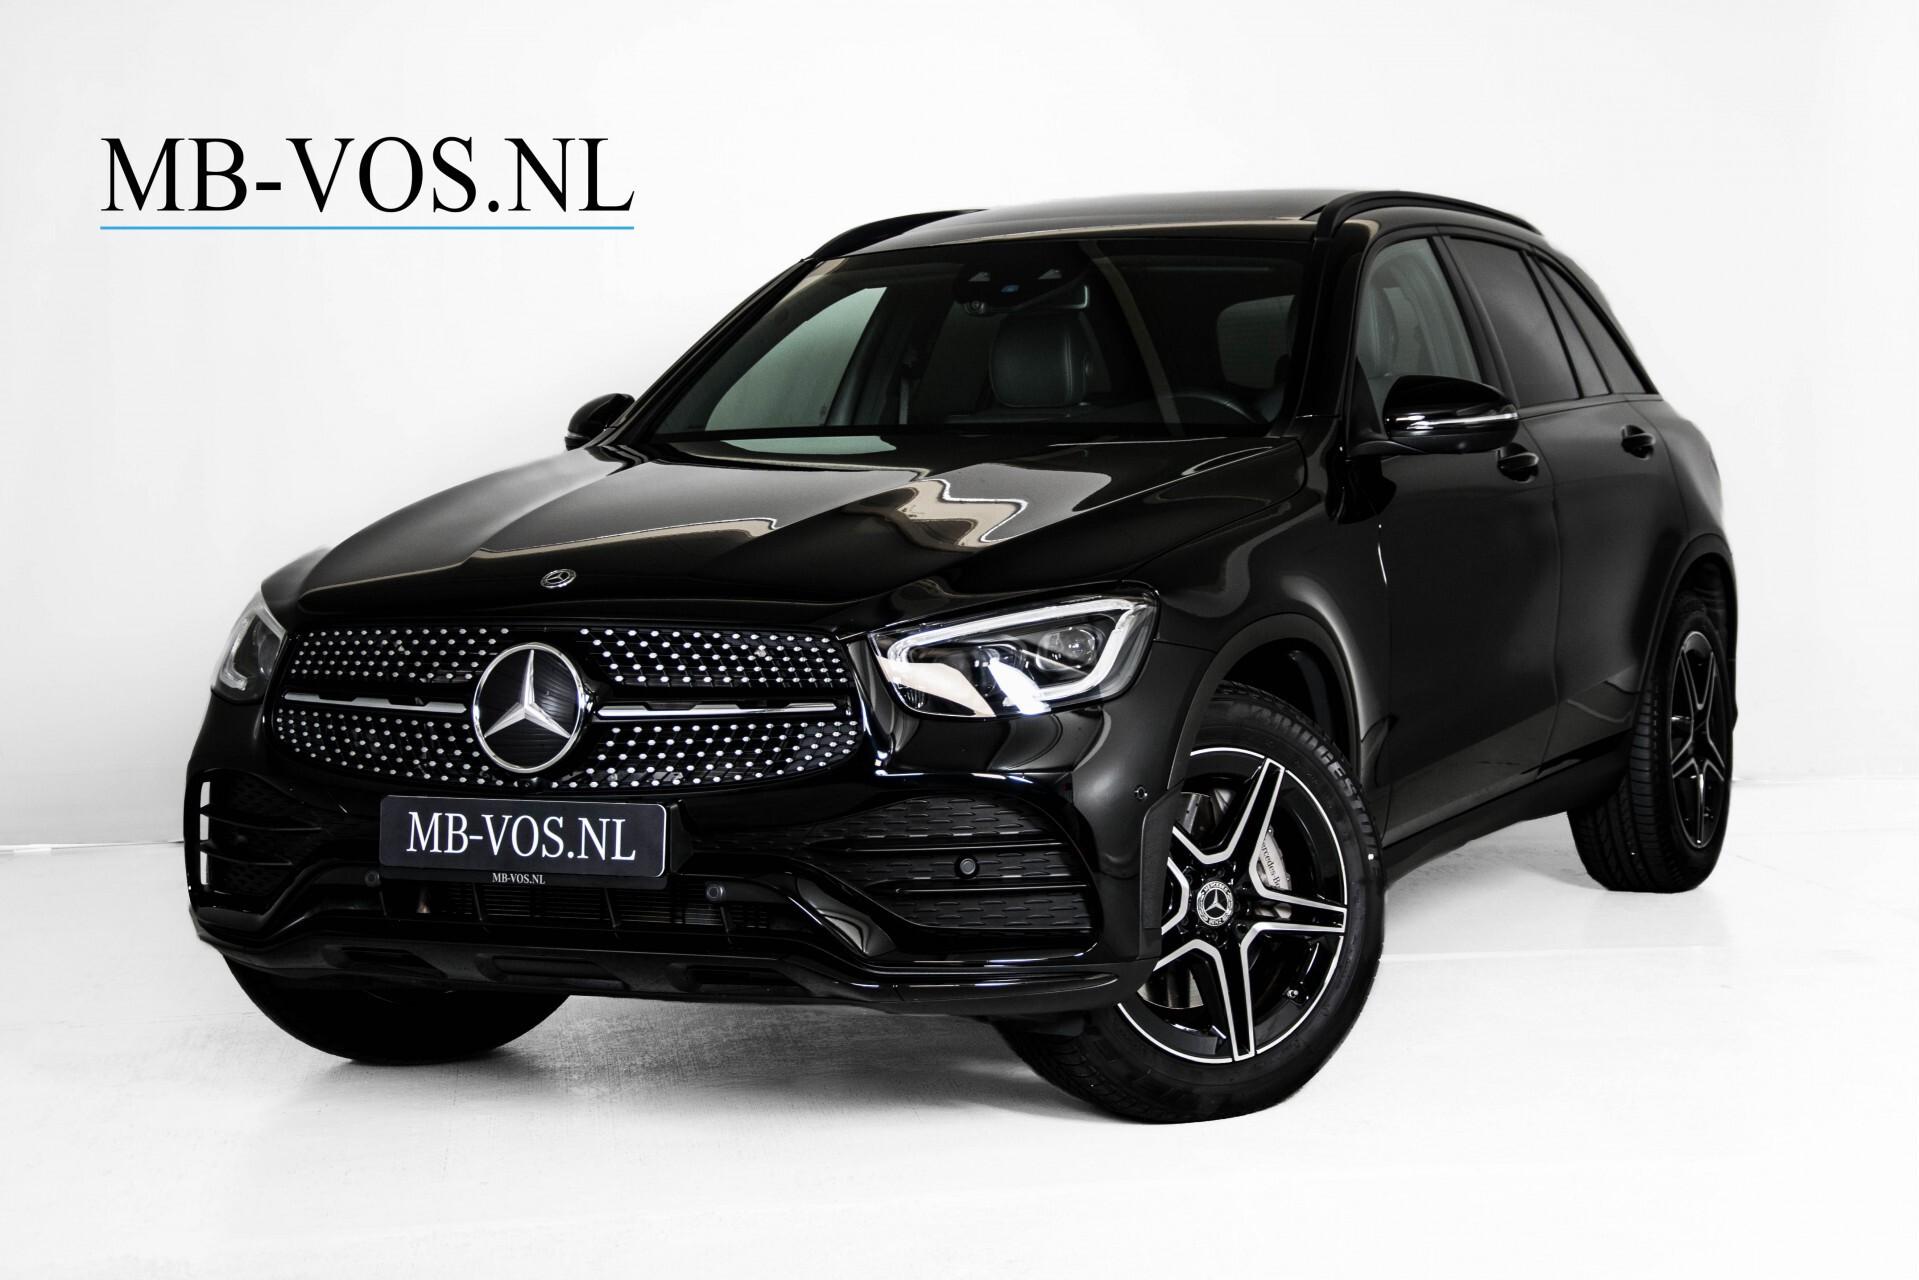 Mercedes-Benz GLC 200 4-M AMG Night/Panorama/Distronic Pro/Burmester/360camera/Exclusive Aut9 Foto 1